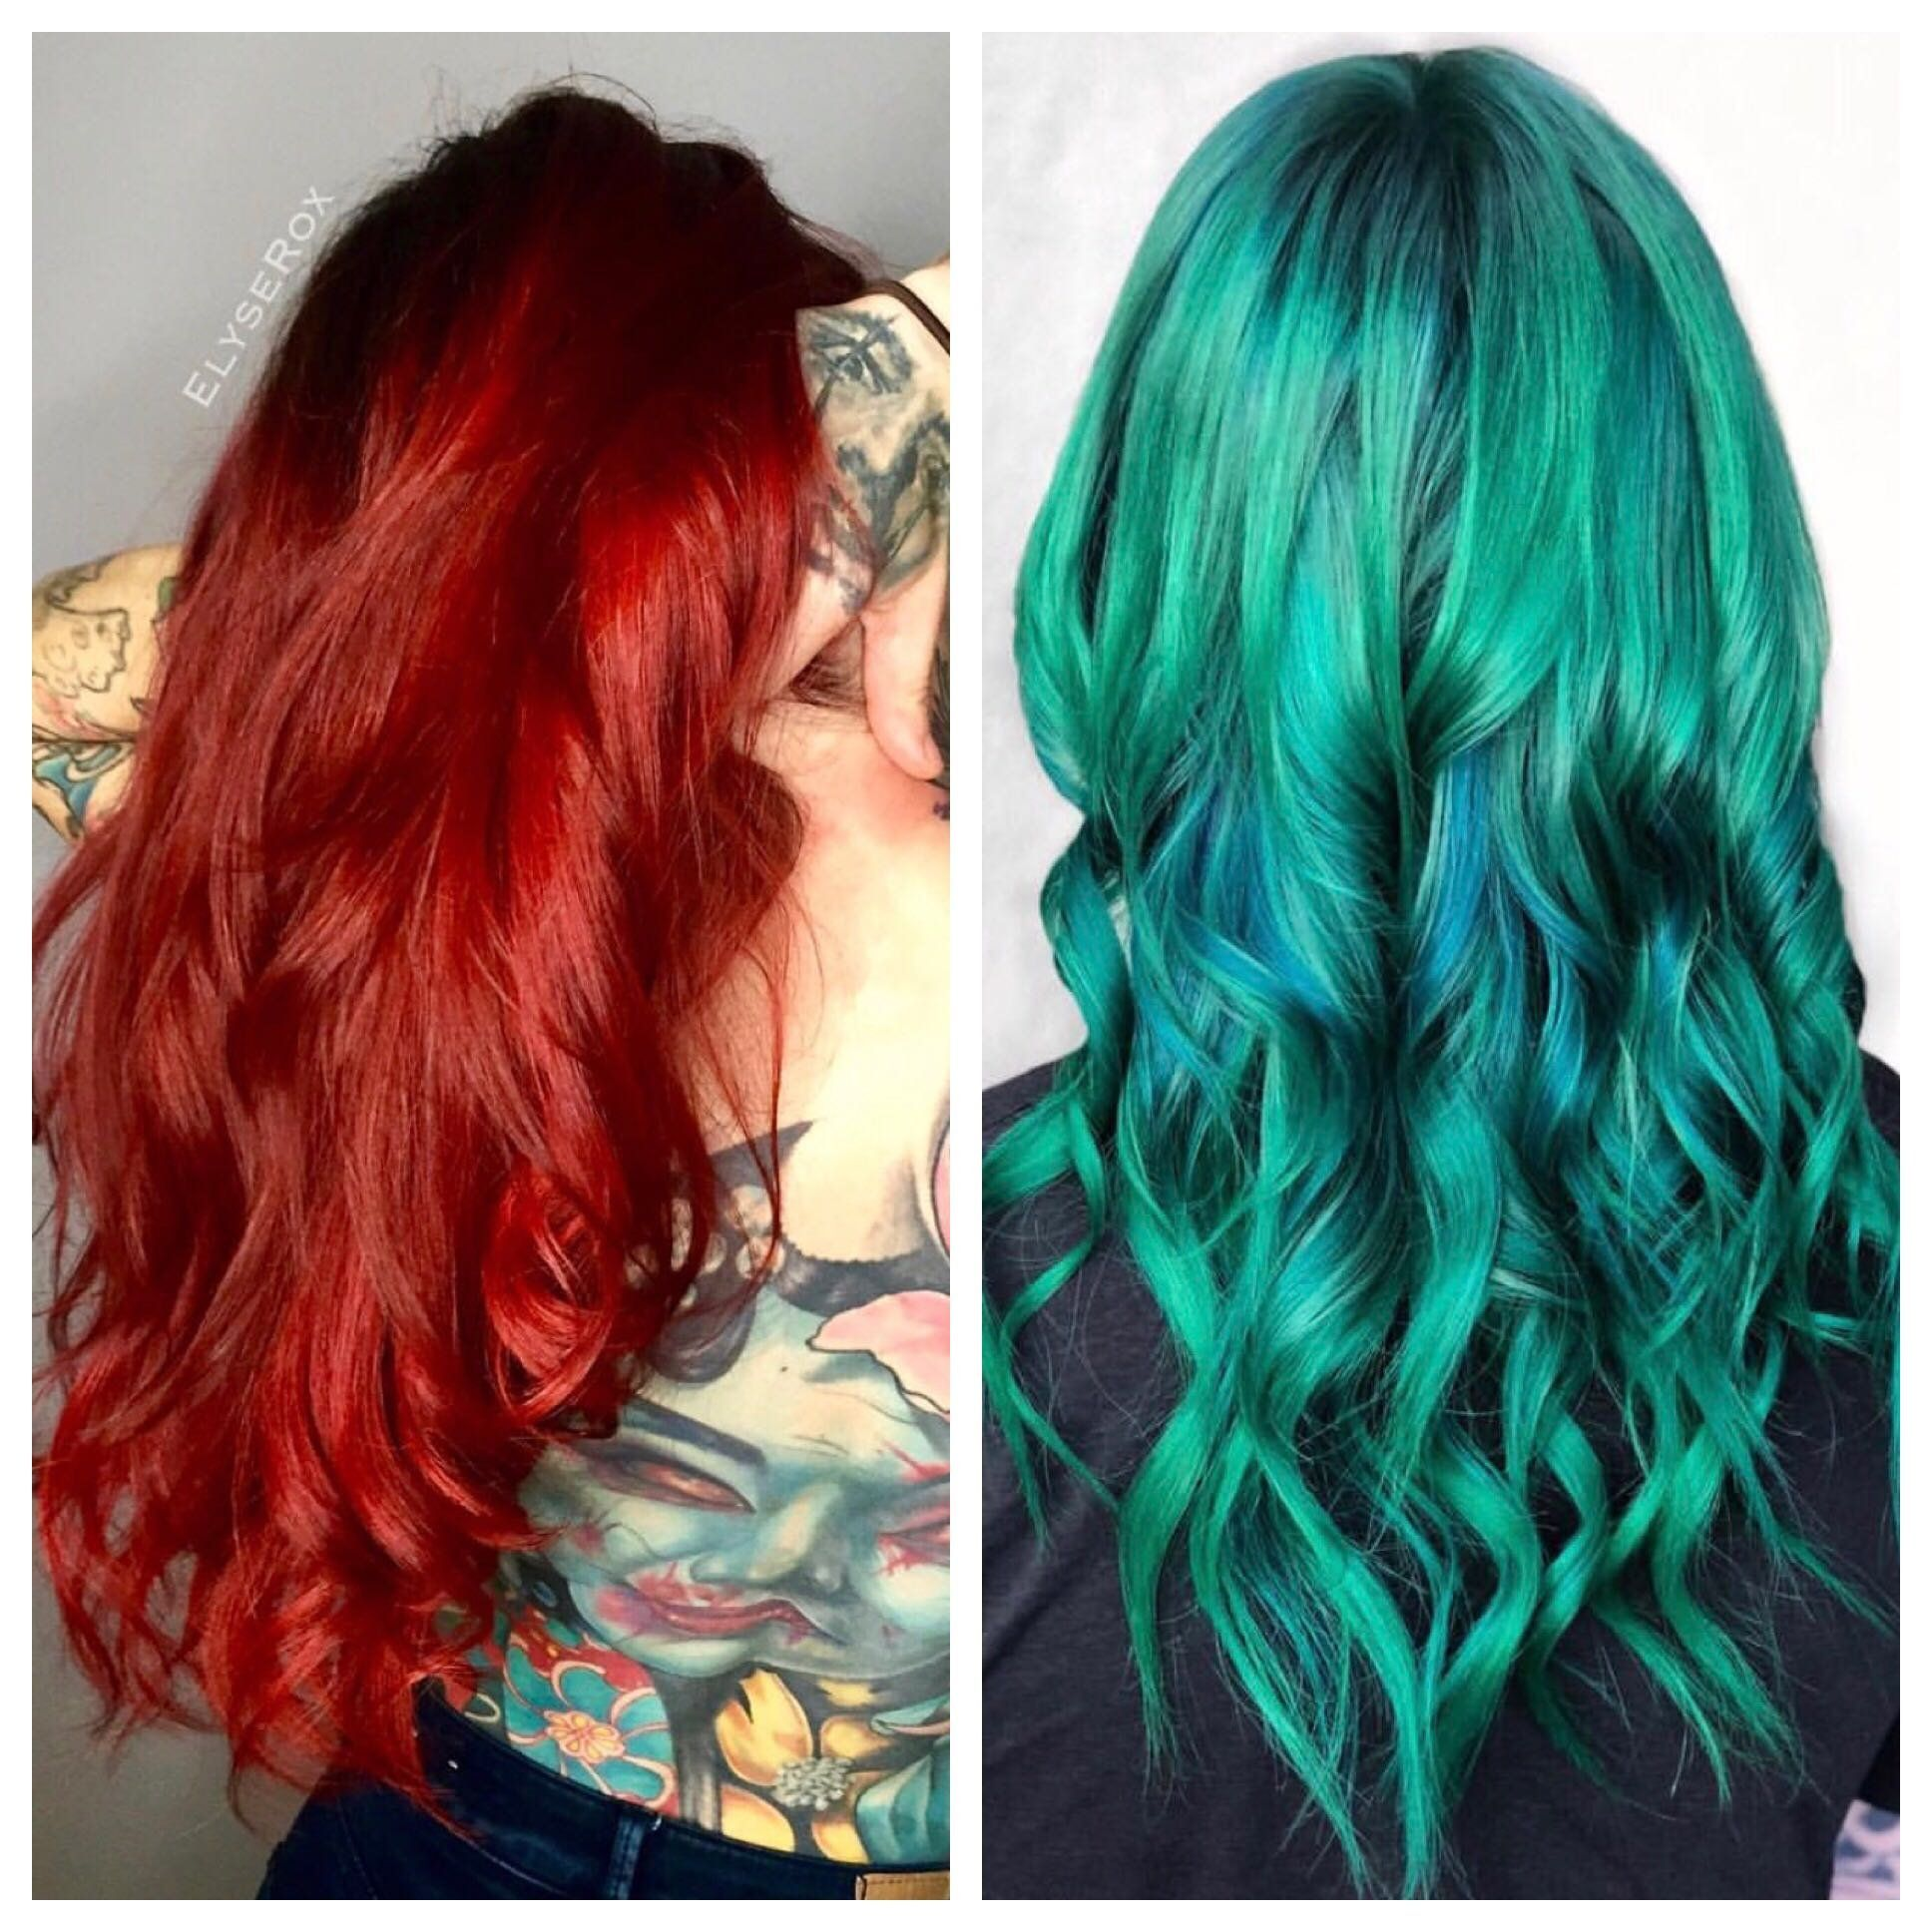 Naughty Or Nice Glam Seamless Hair Extensions Hair By Elyserox00